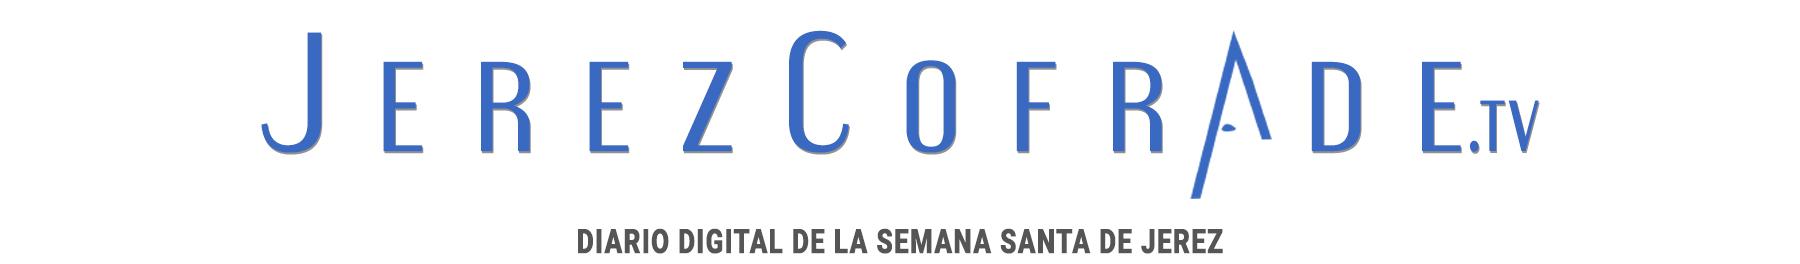 Jerez Cofrade